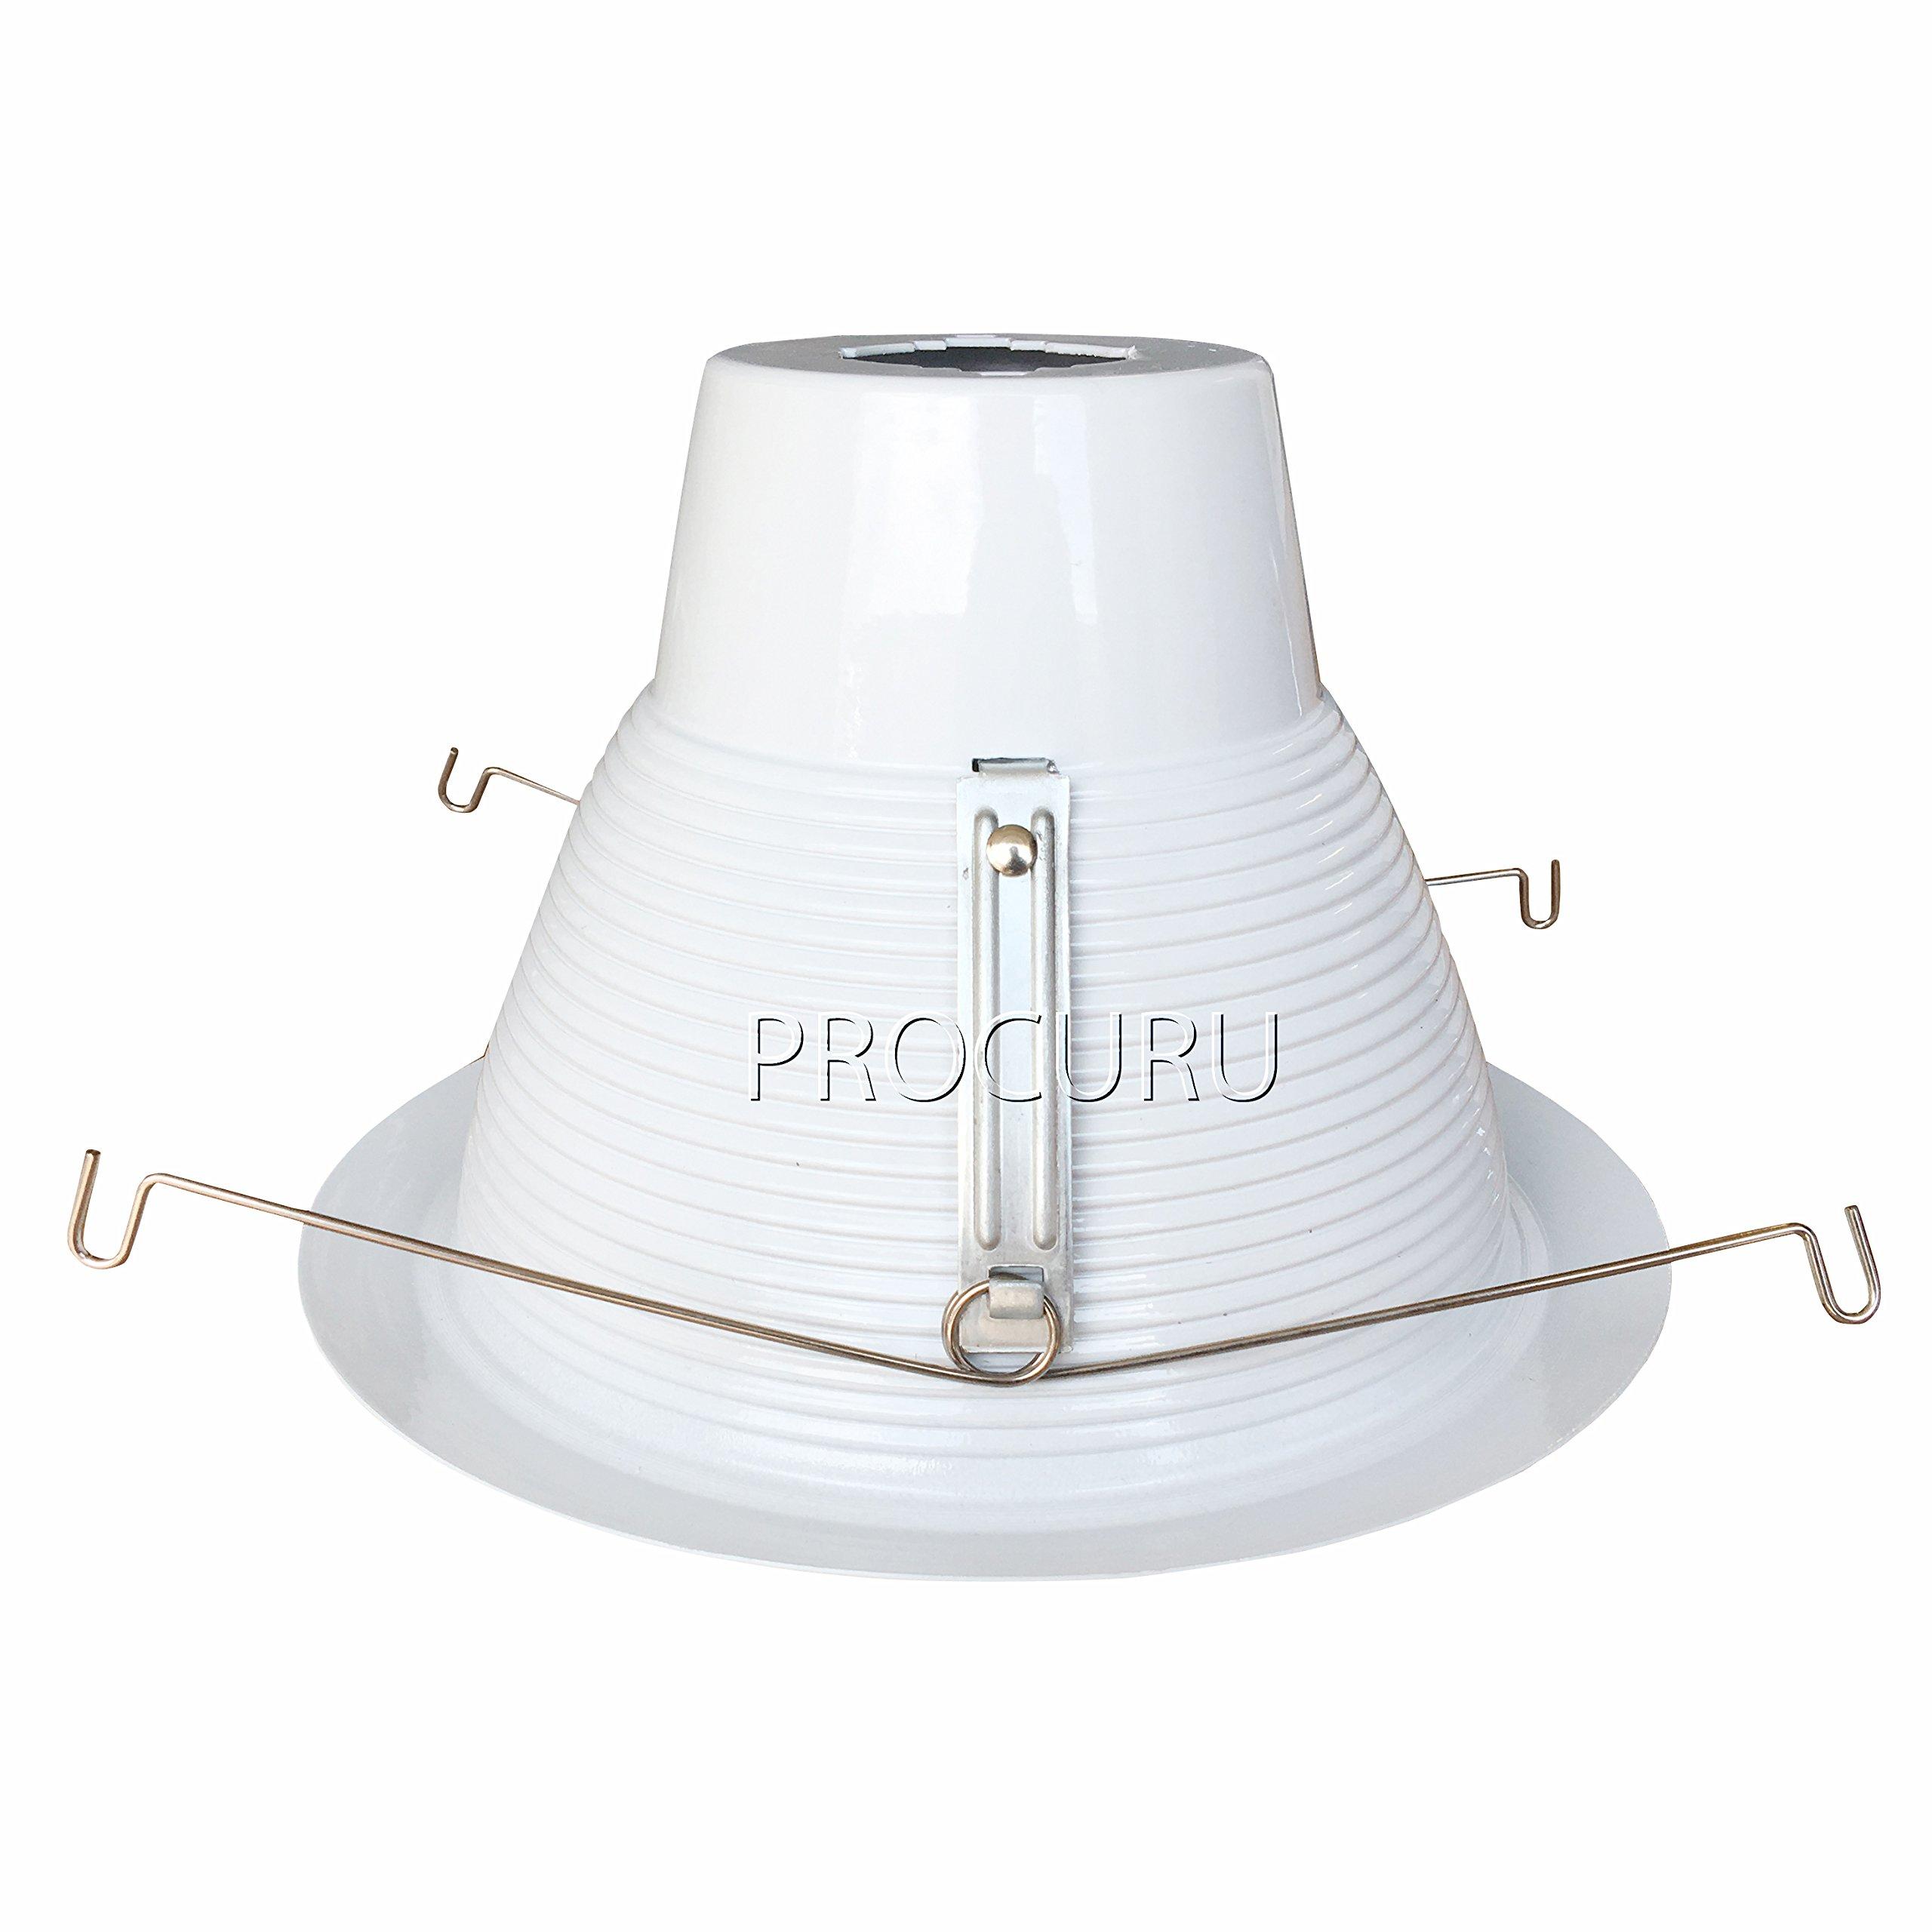 6 Pack Procuru 6 Quot Recessed Can Light Trim Solid Metal